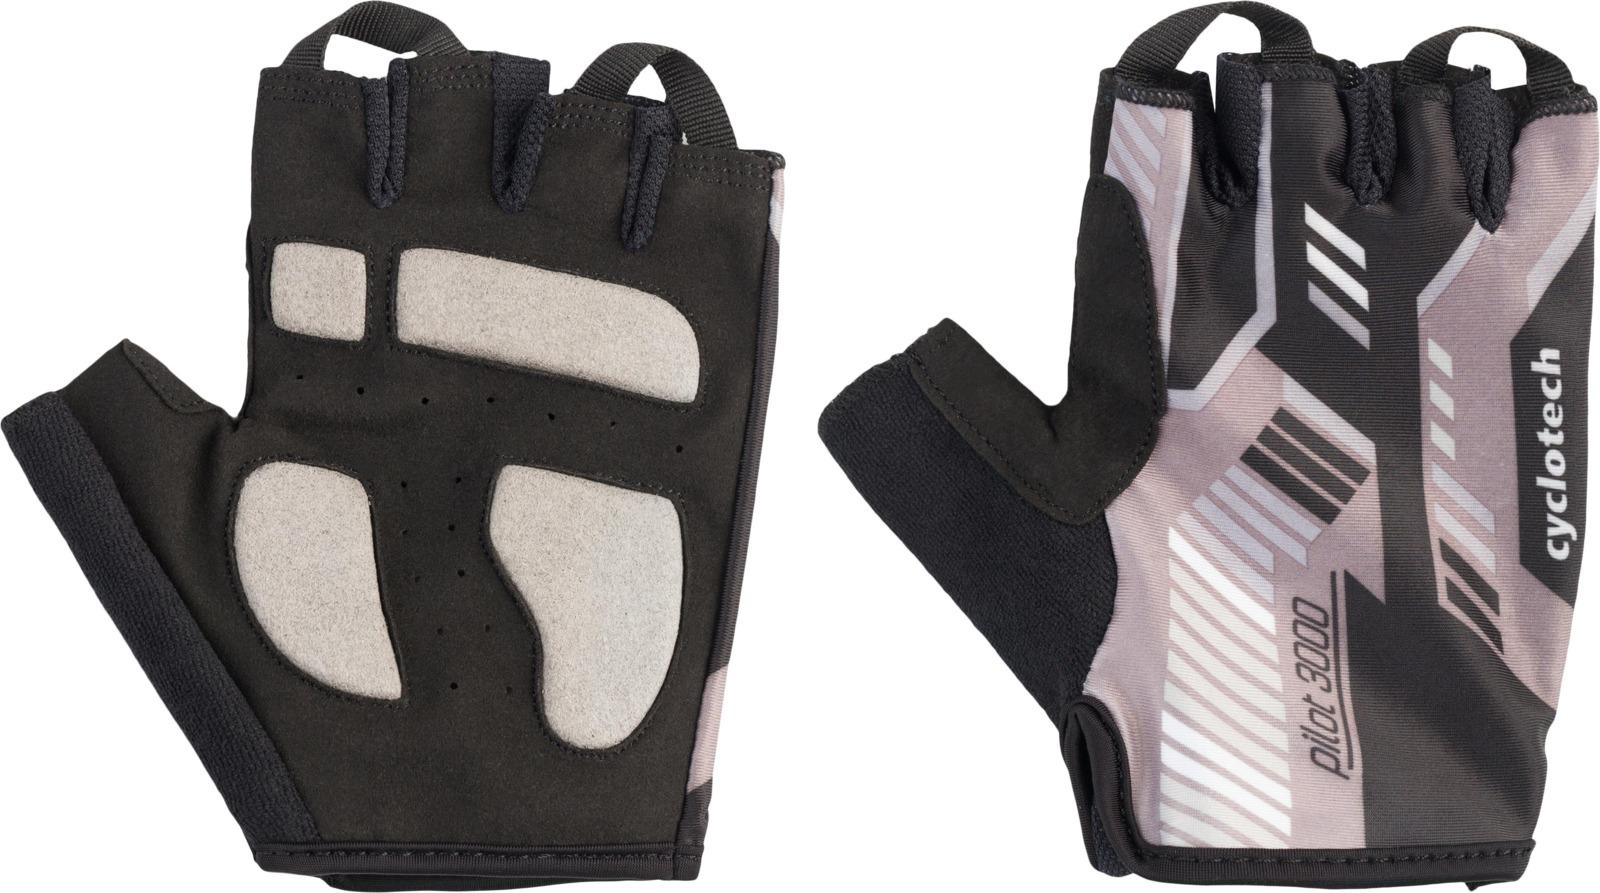 Велоперчатки Cyclotech PILOT Bike gloves, черный, серый, размер M цена